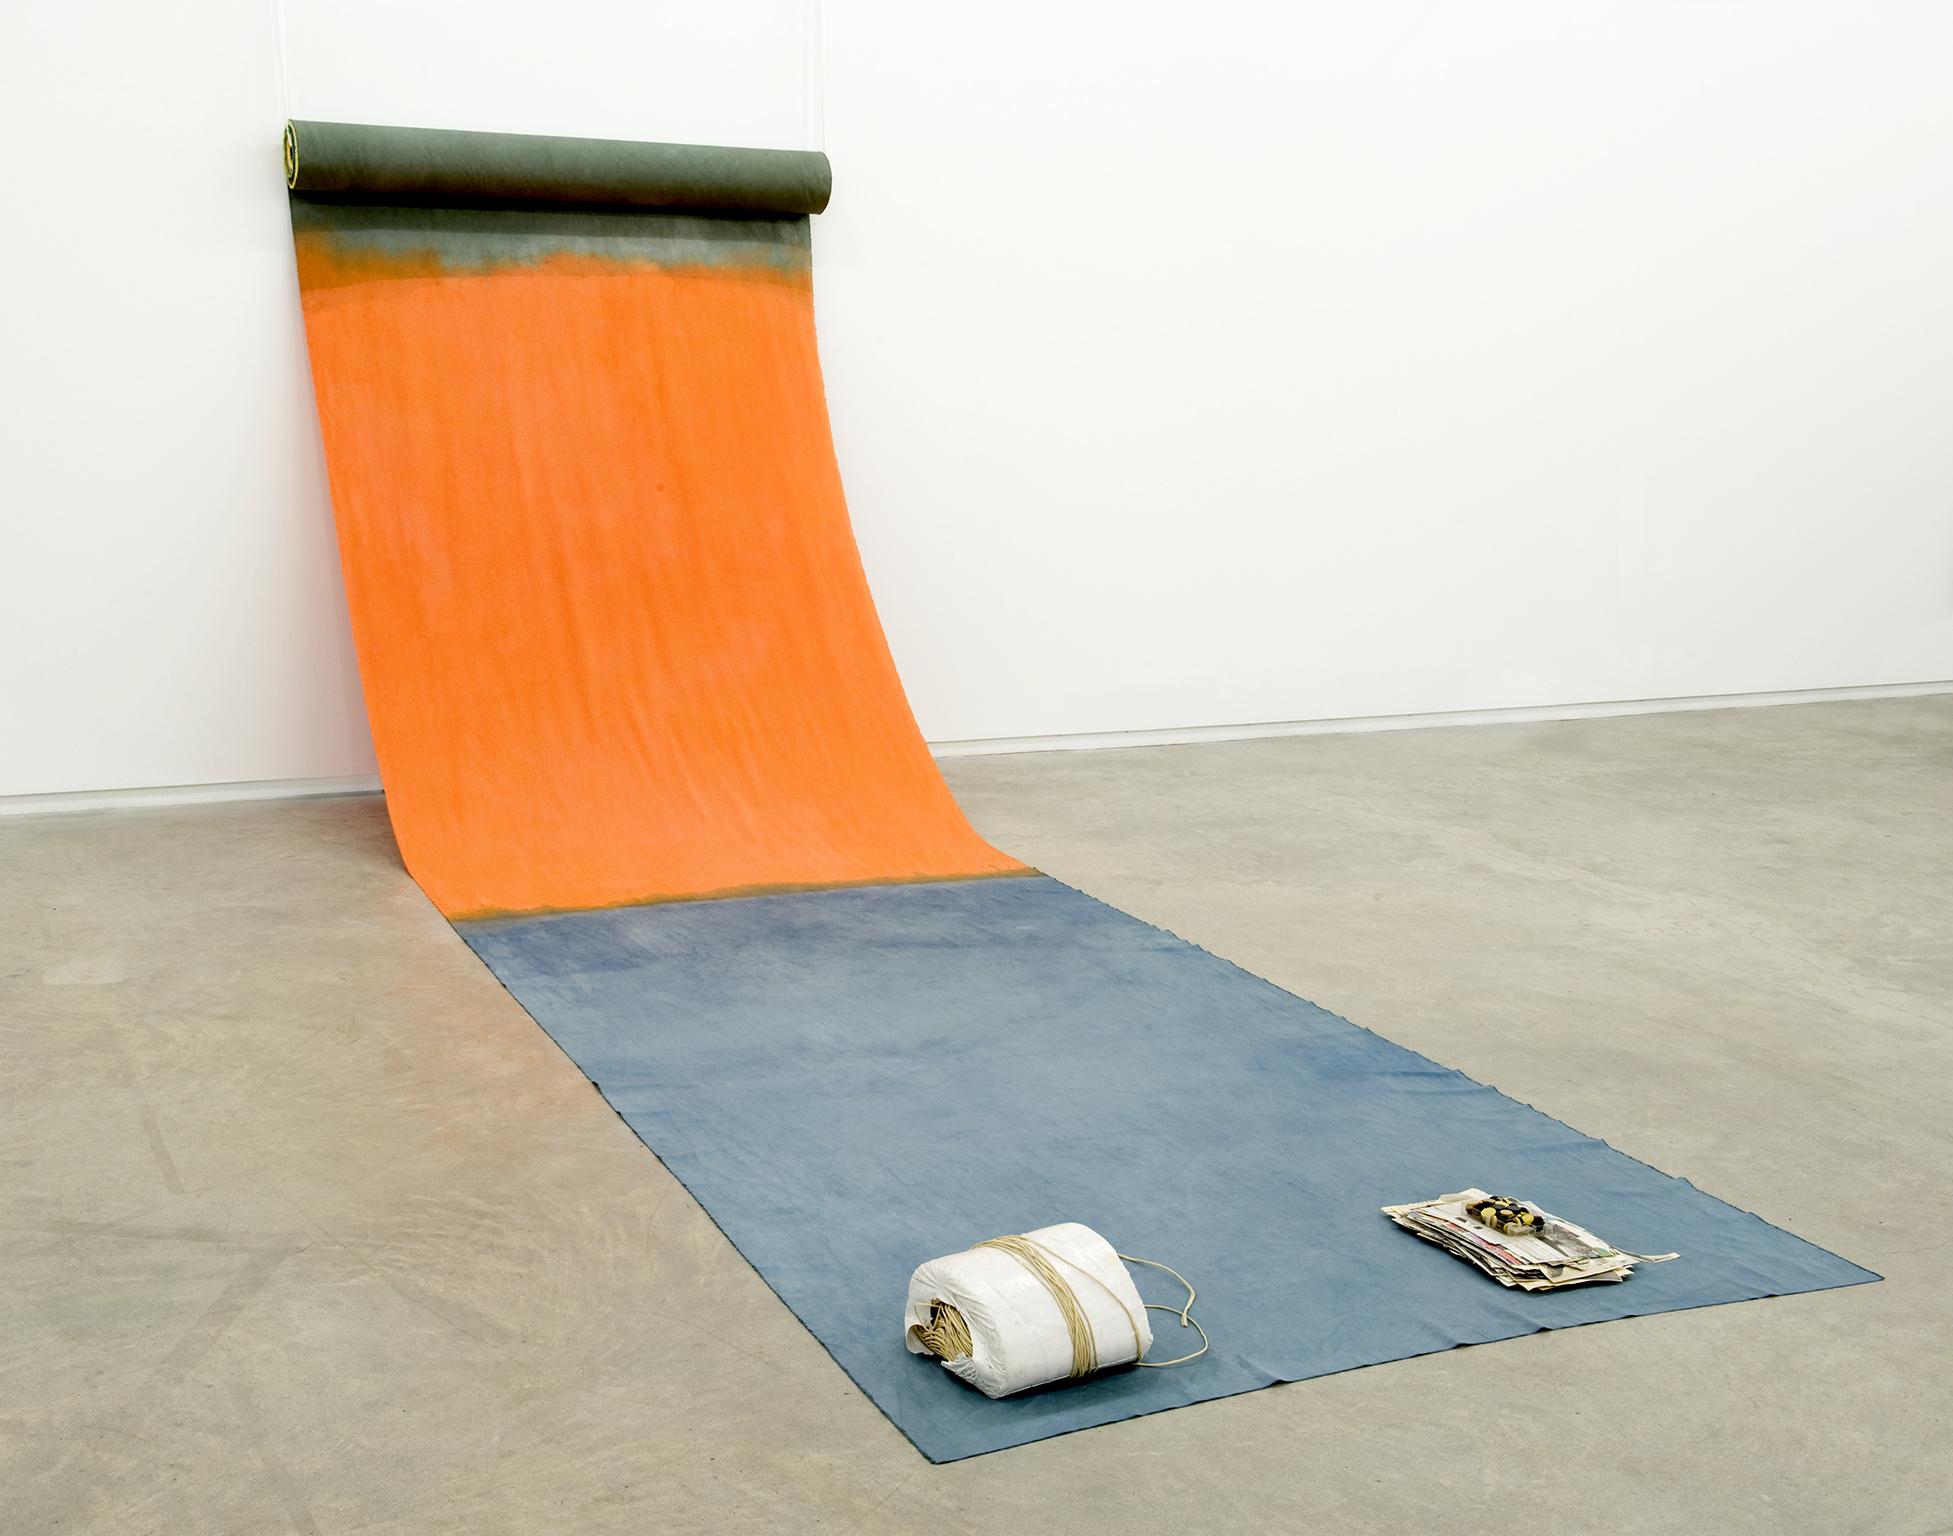 Ulla von Brandenburg, Das Versteck des R.M. (The hiding of R.M.), 2011, mixed media, dimensions variable by